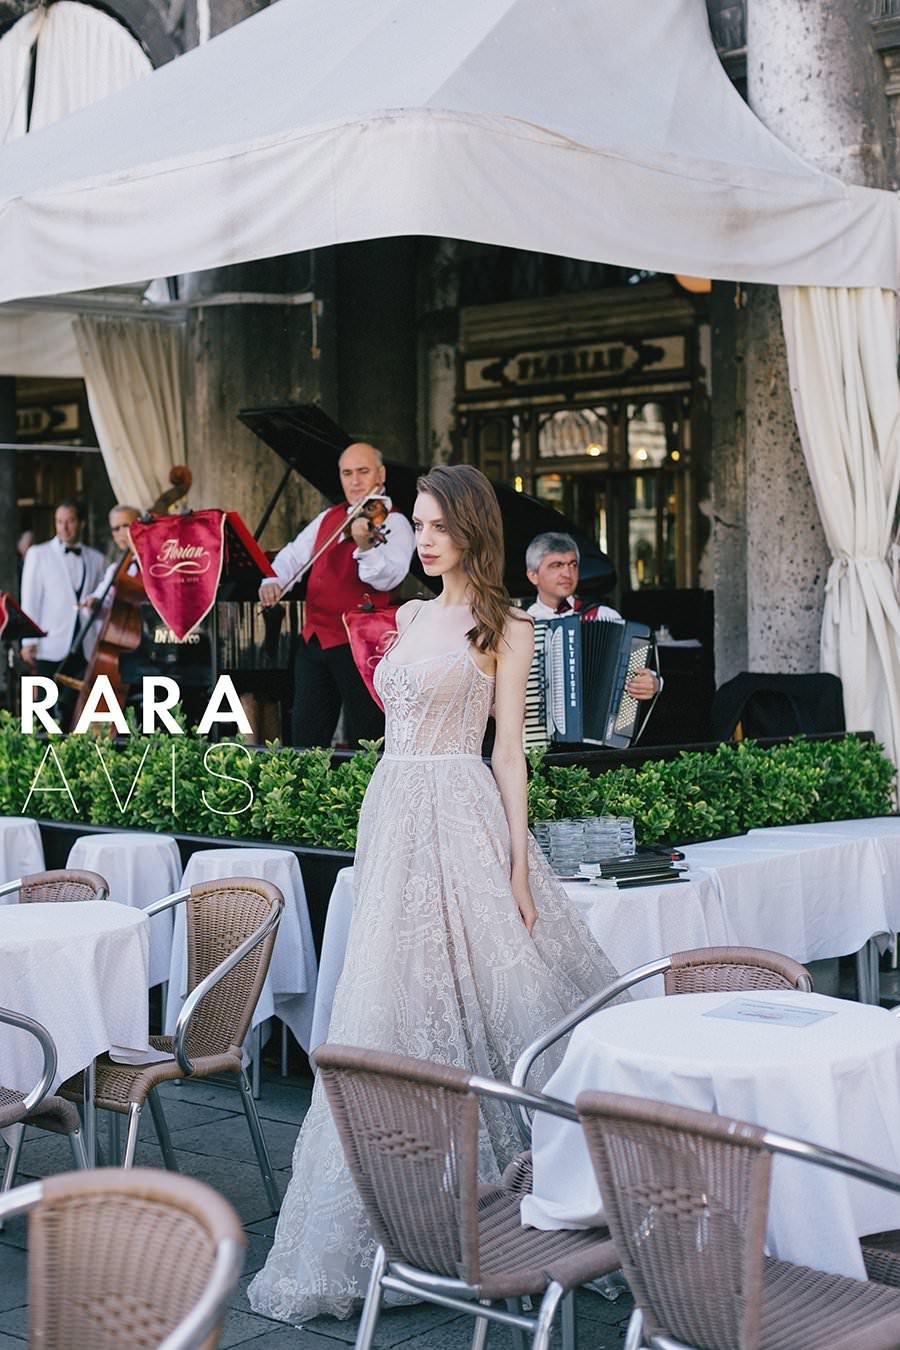 Wedding gown Rara Avis Lovia